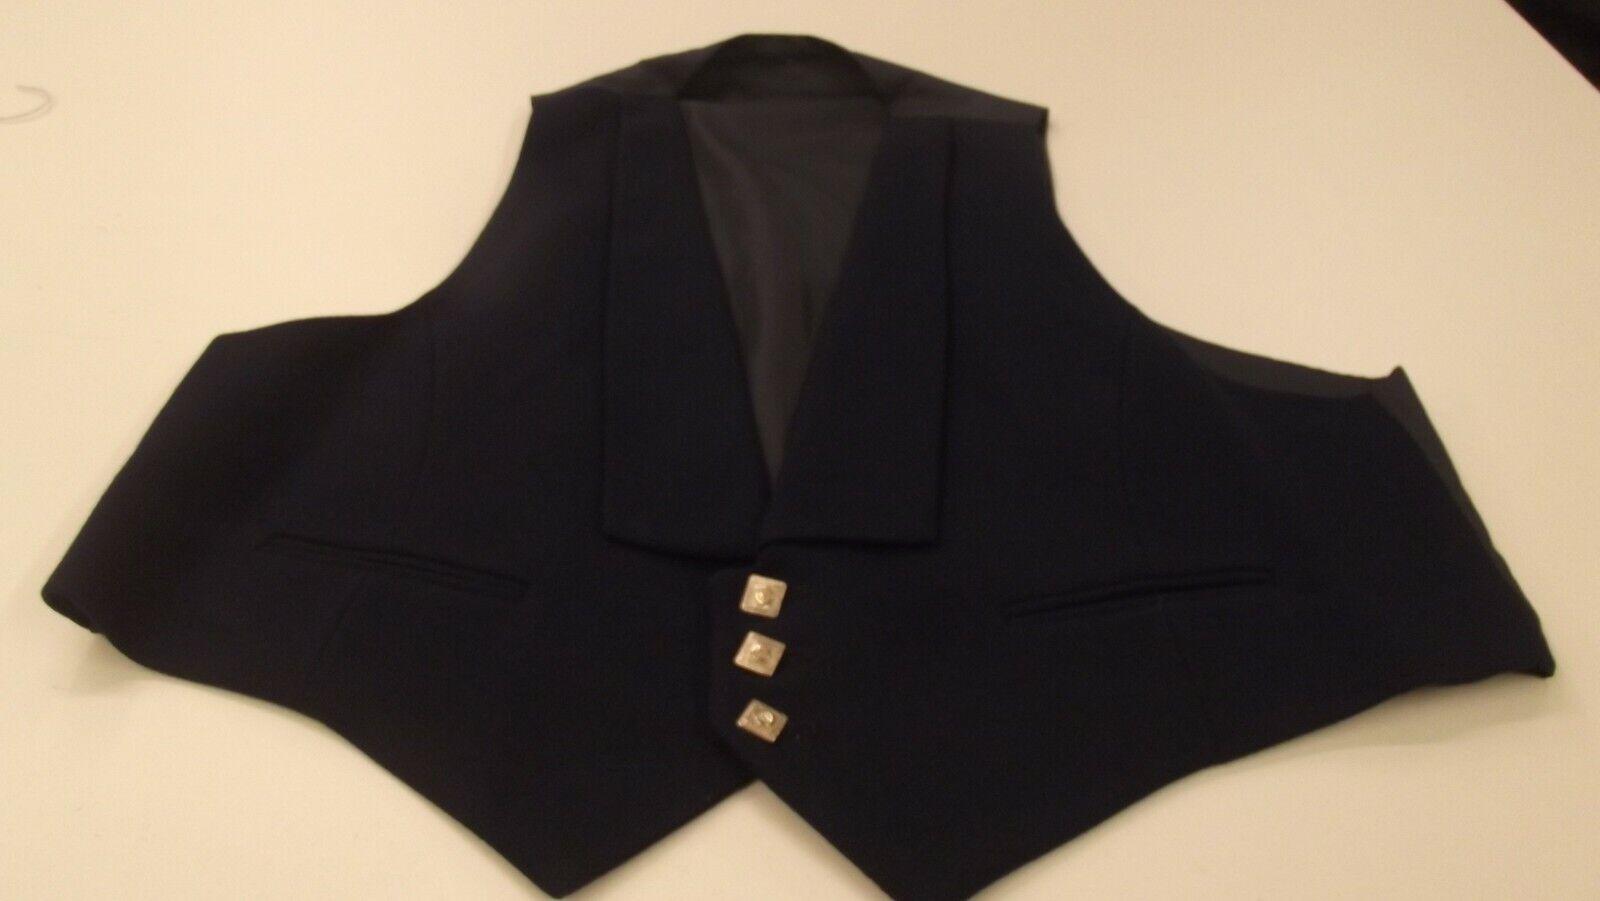 Ex-Hire 3 Button Navy Blue Prince Charlie Waistcoat - 46 Short 46S